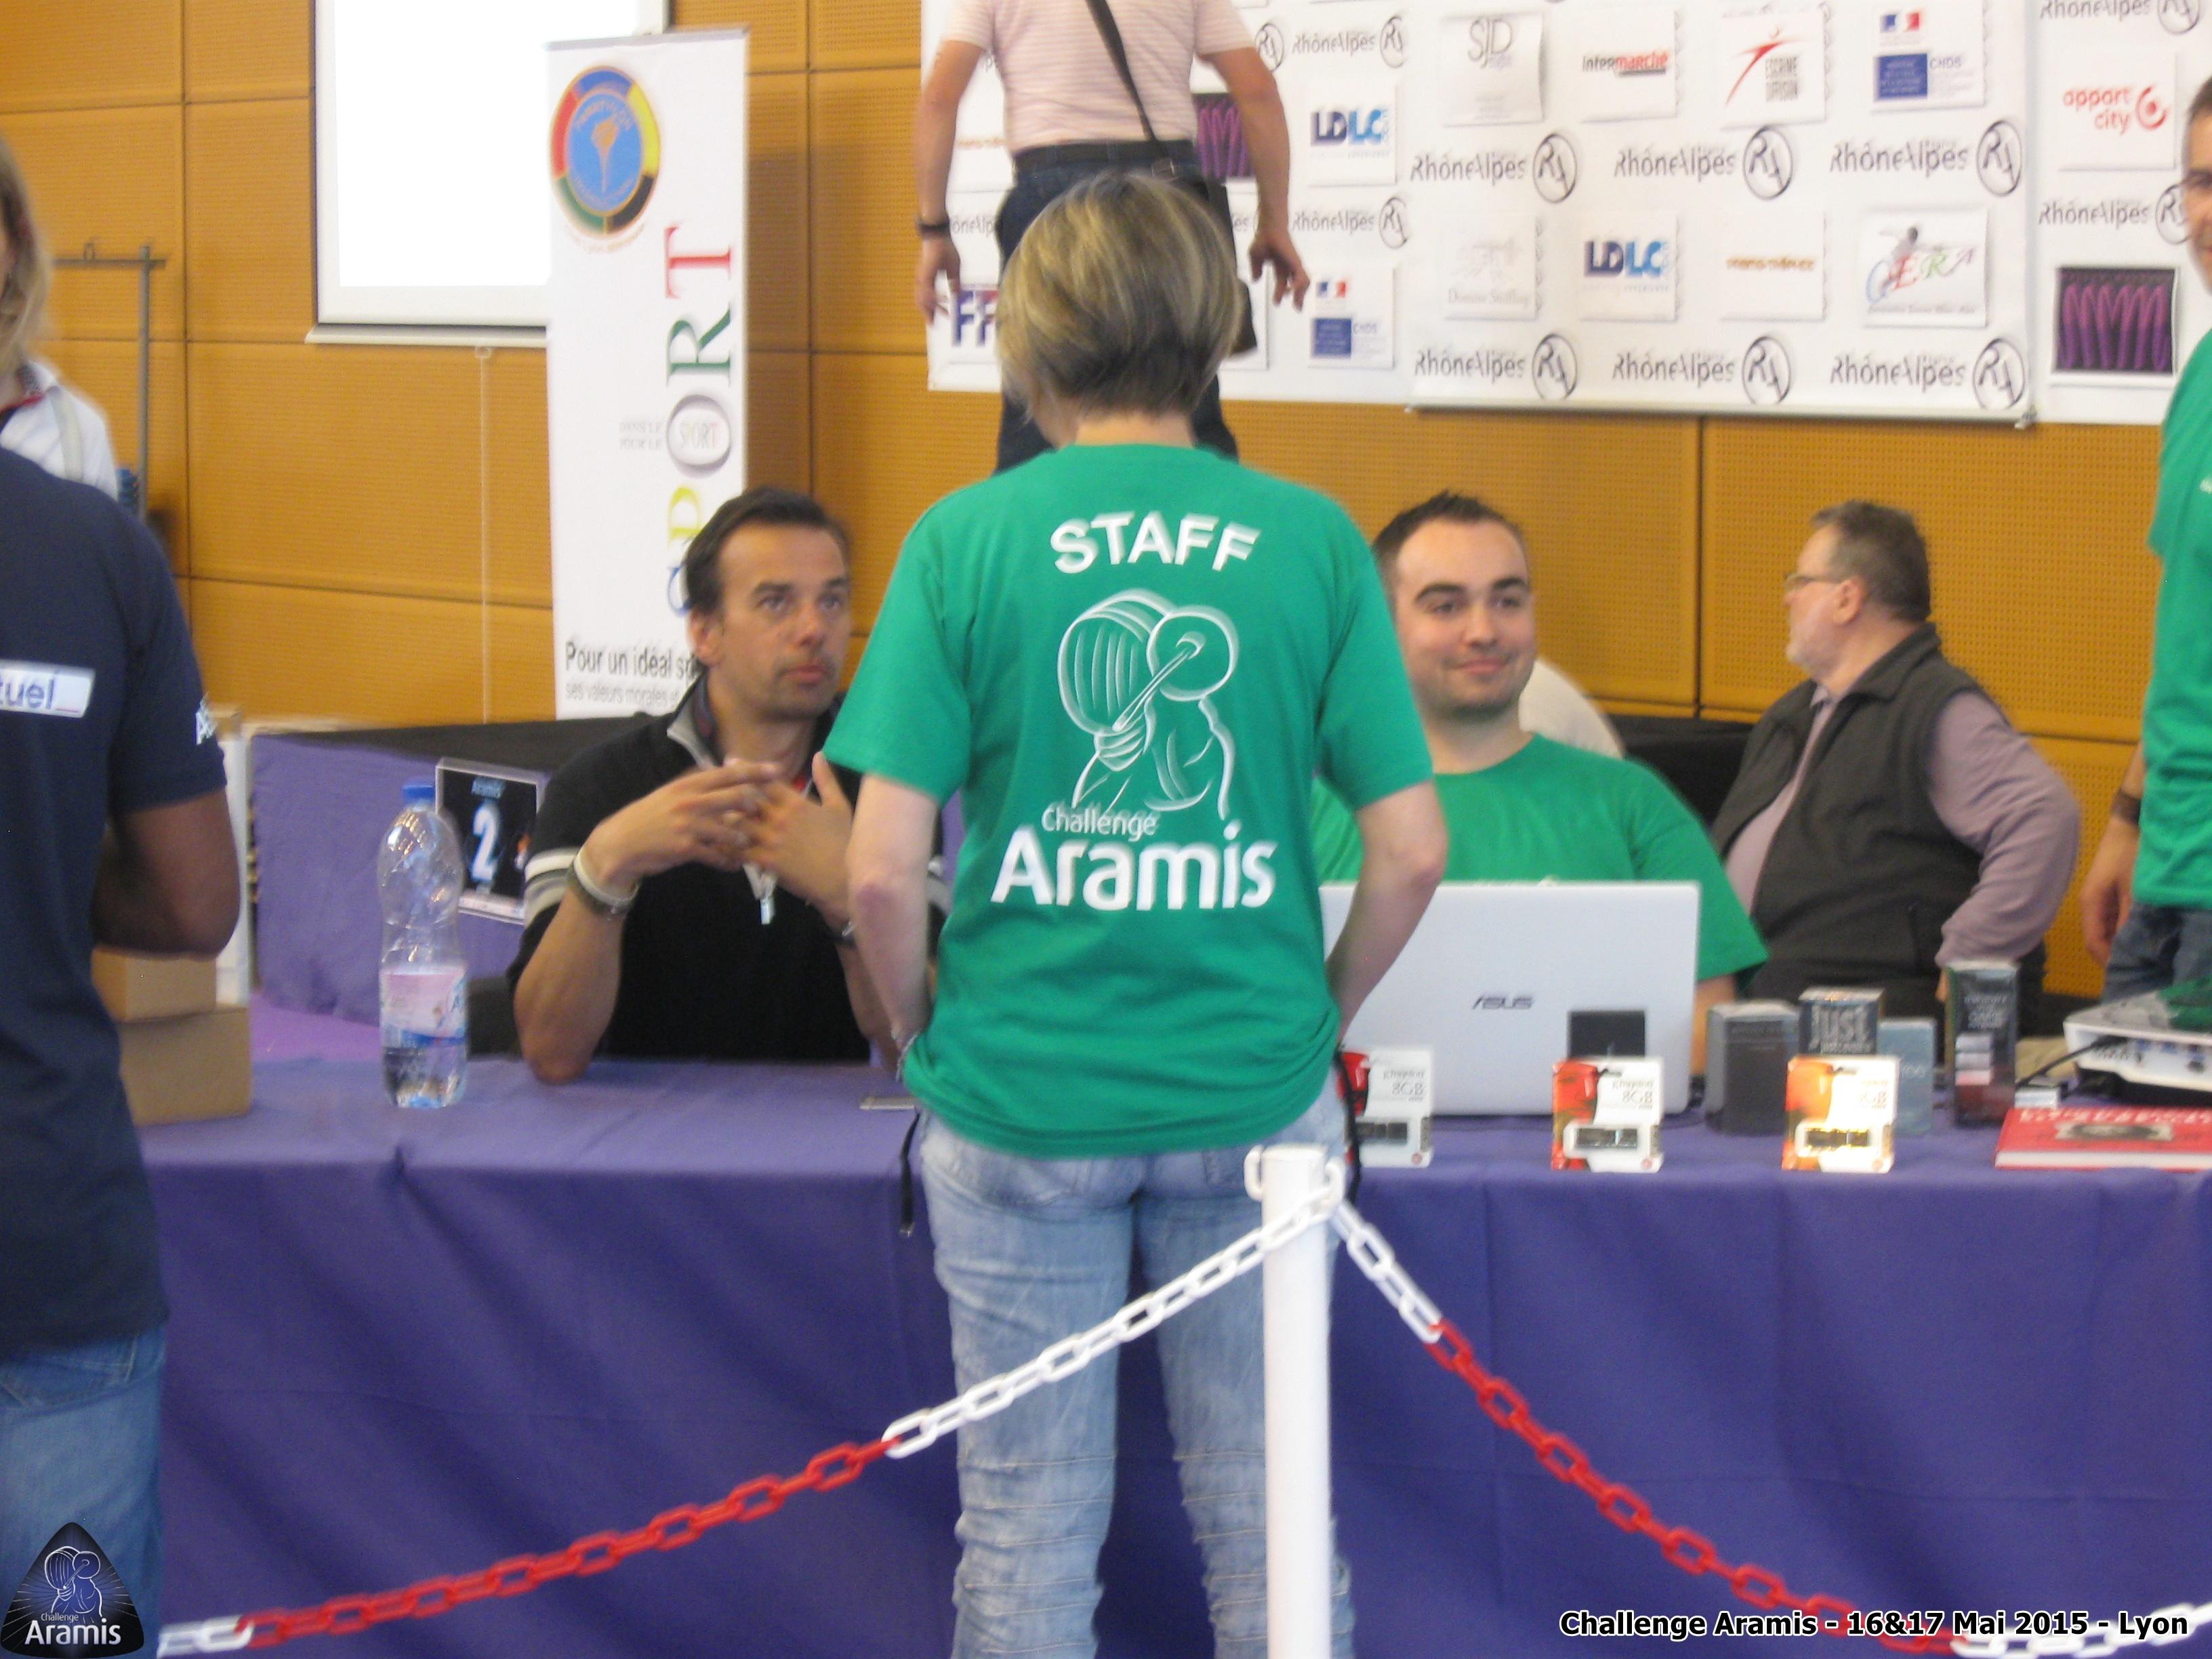 Aramis2015-19800101,00.03.33,1297